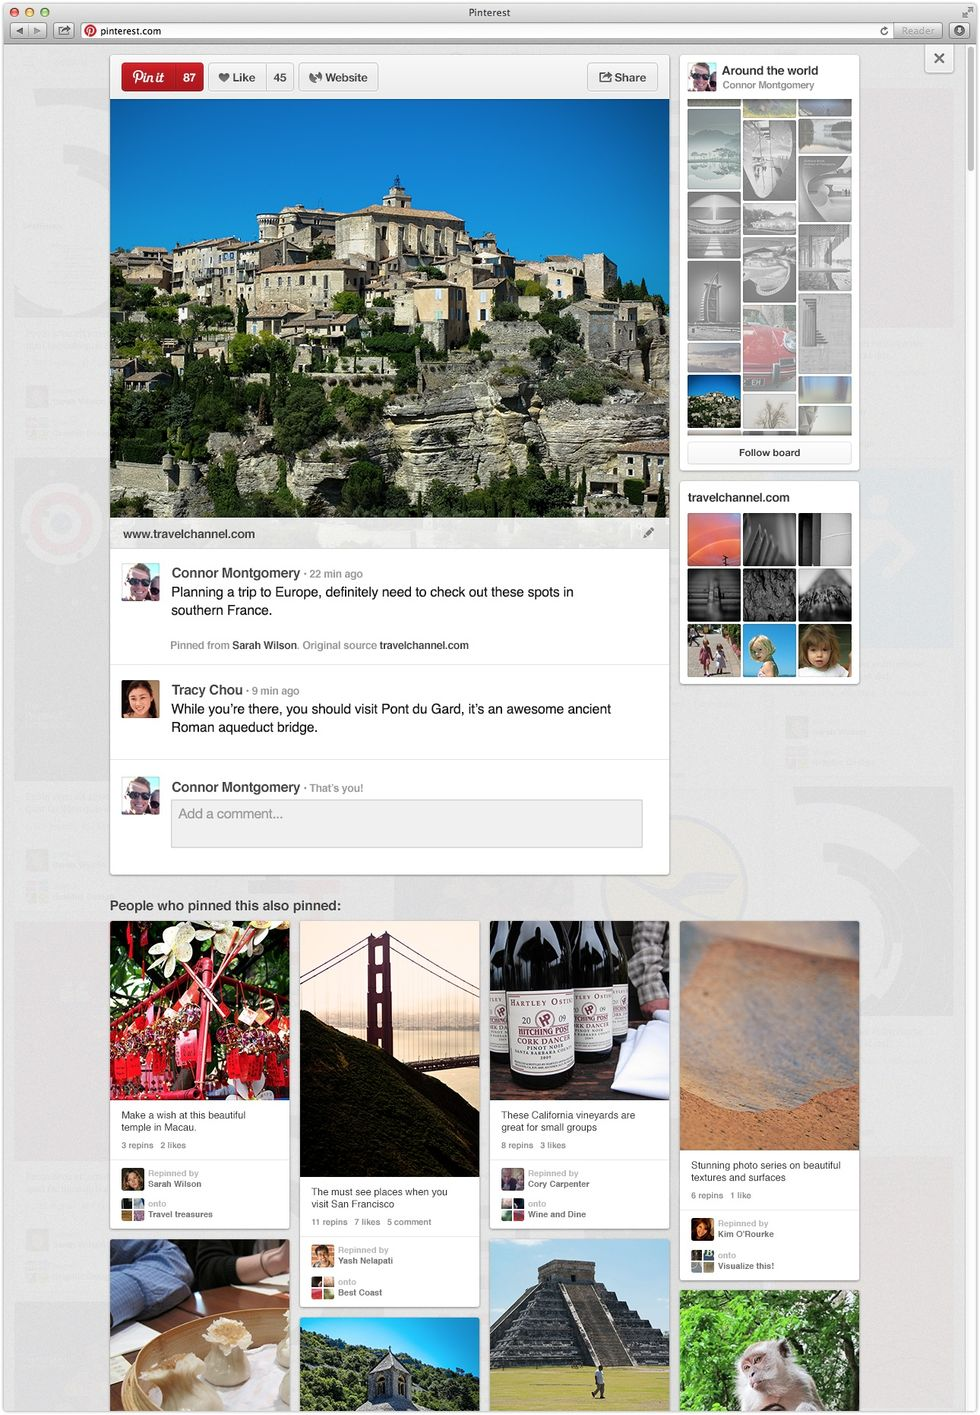 Pinterest cambia faccia, ora è una macchina da soldi (potenziale)